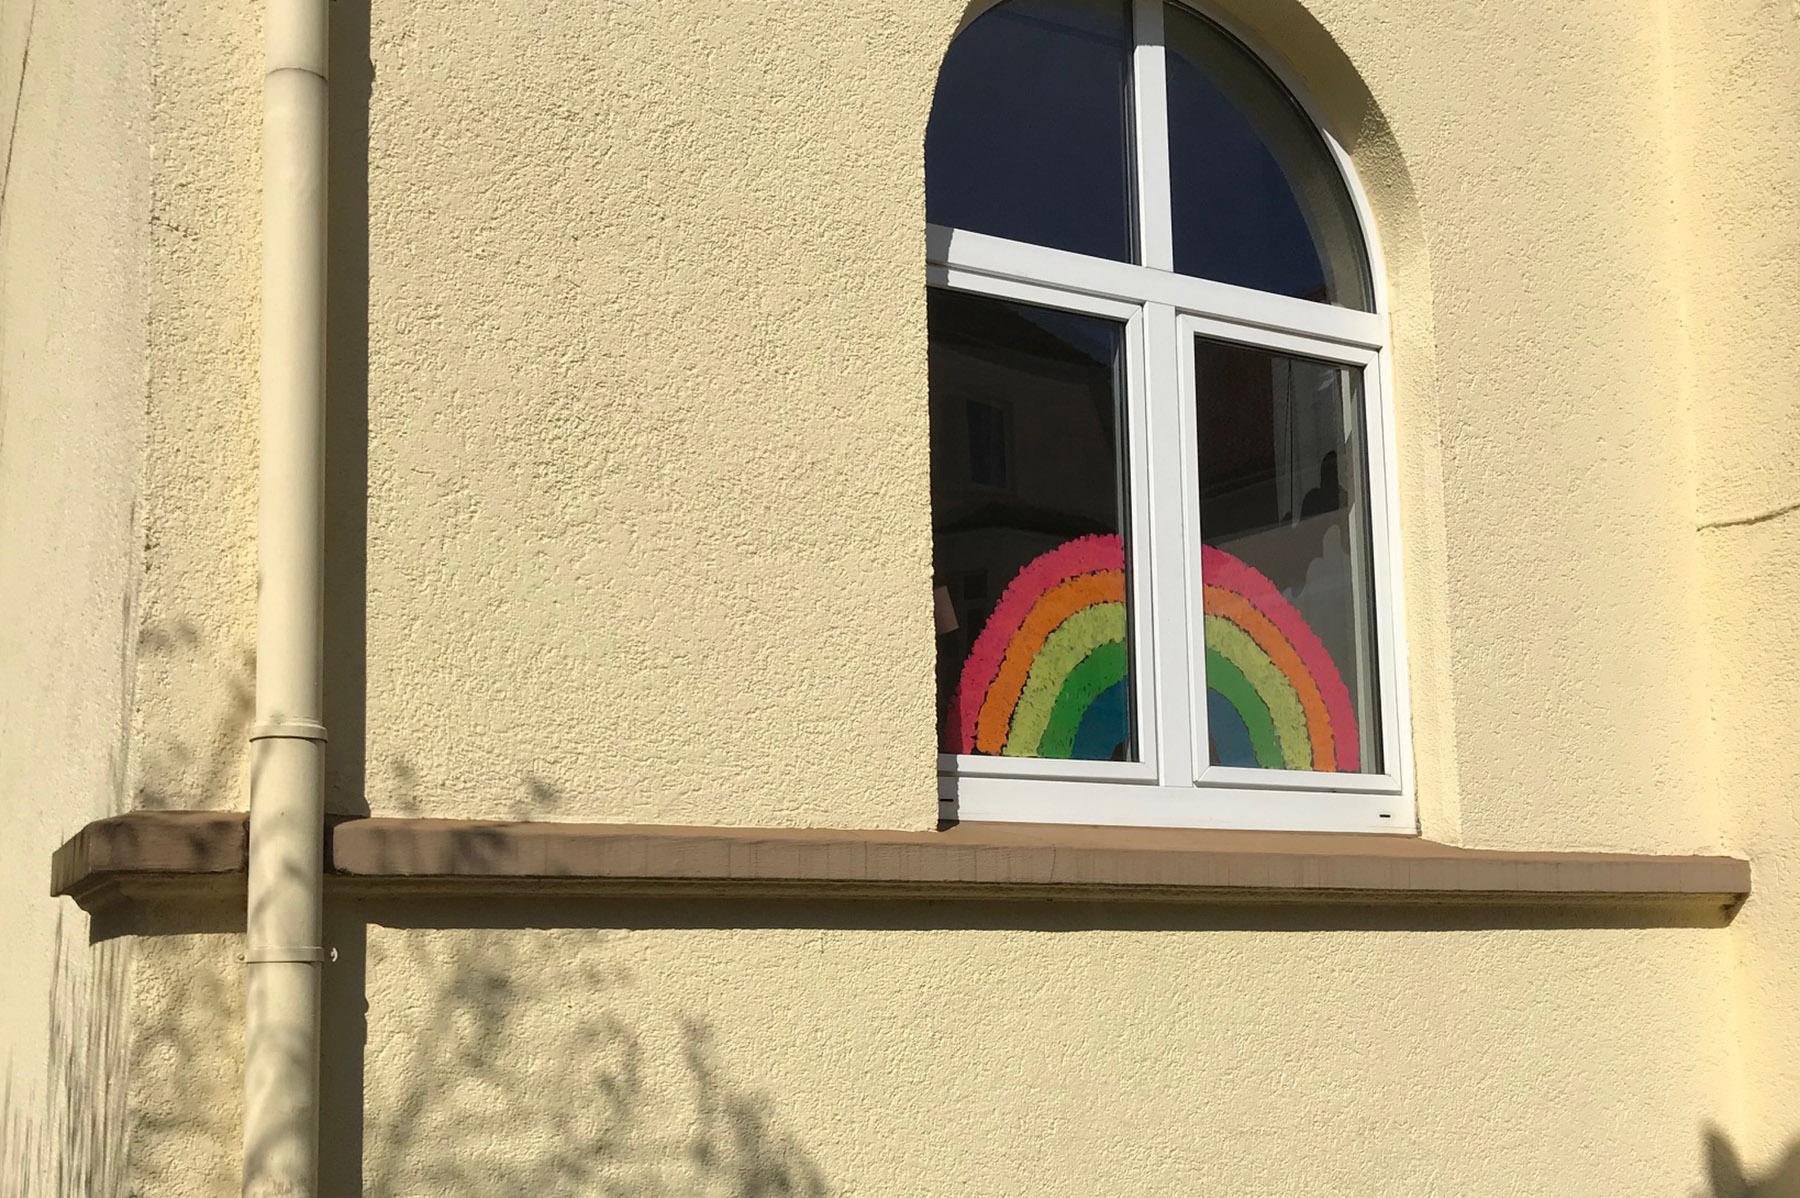 Regenbogen-Fenster